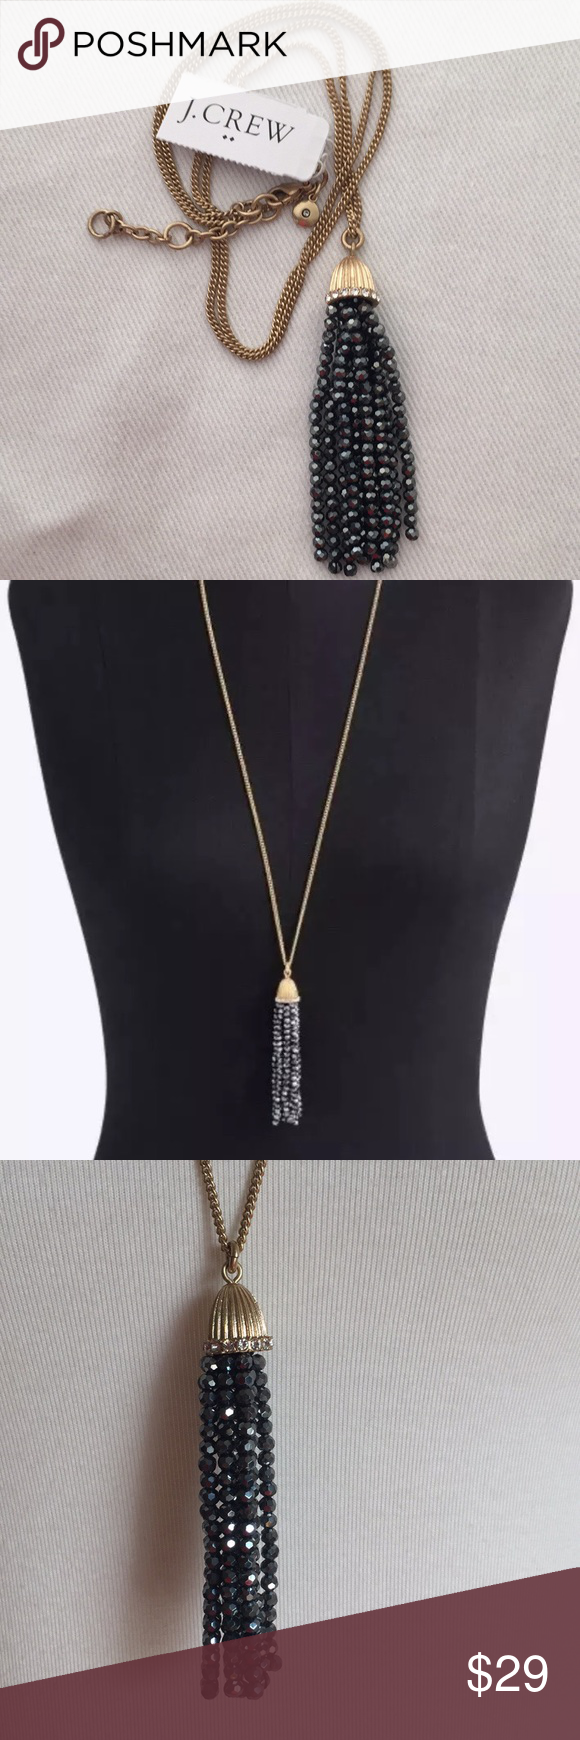 Nwt jcrew beaded tassel drop pendant necklace nwt